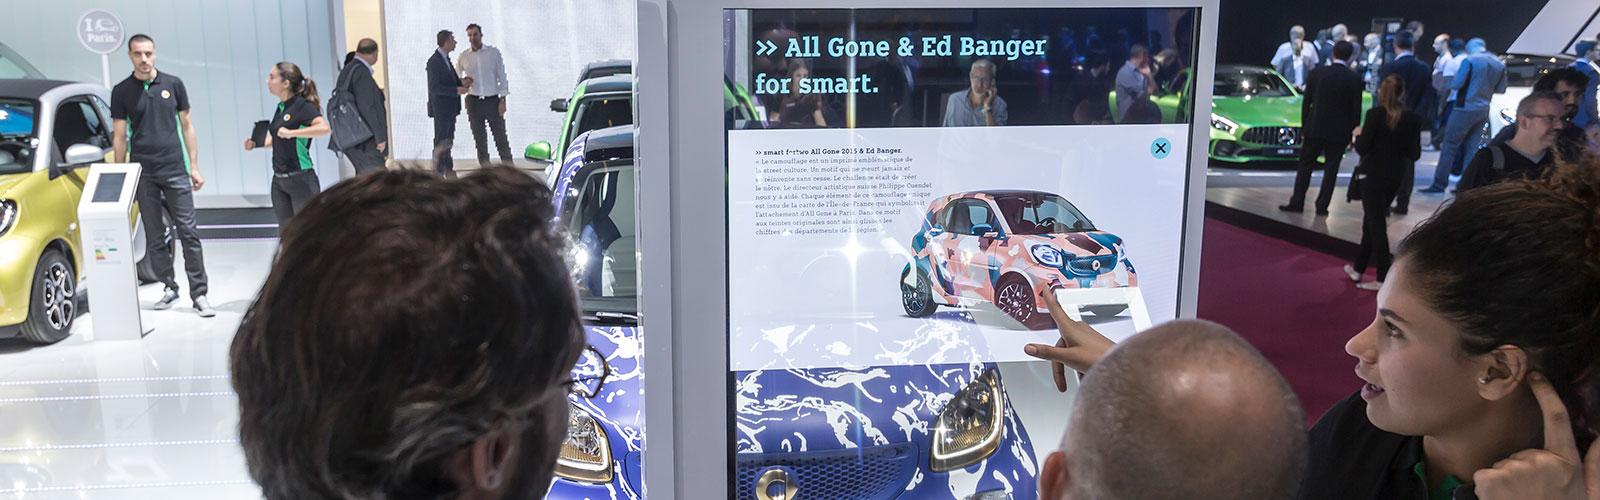 Braunwagner Digital Media Design smart interactive exhibits since 2011